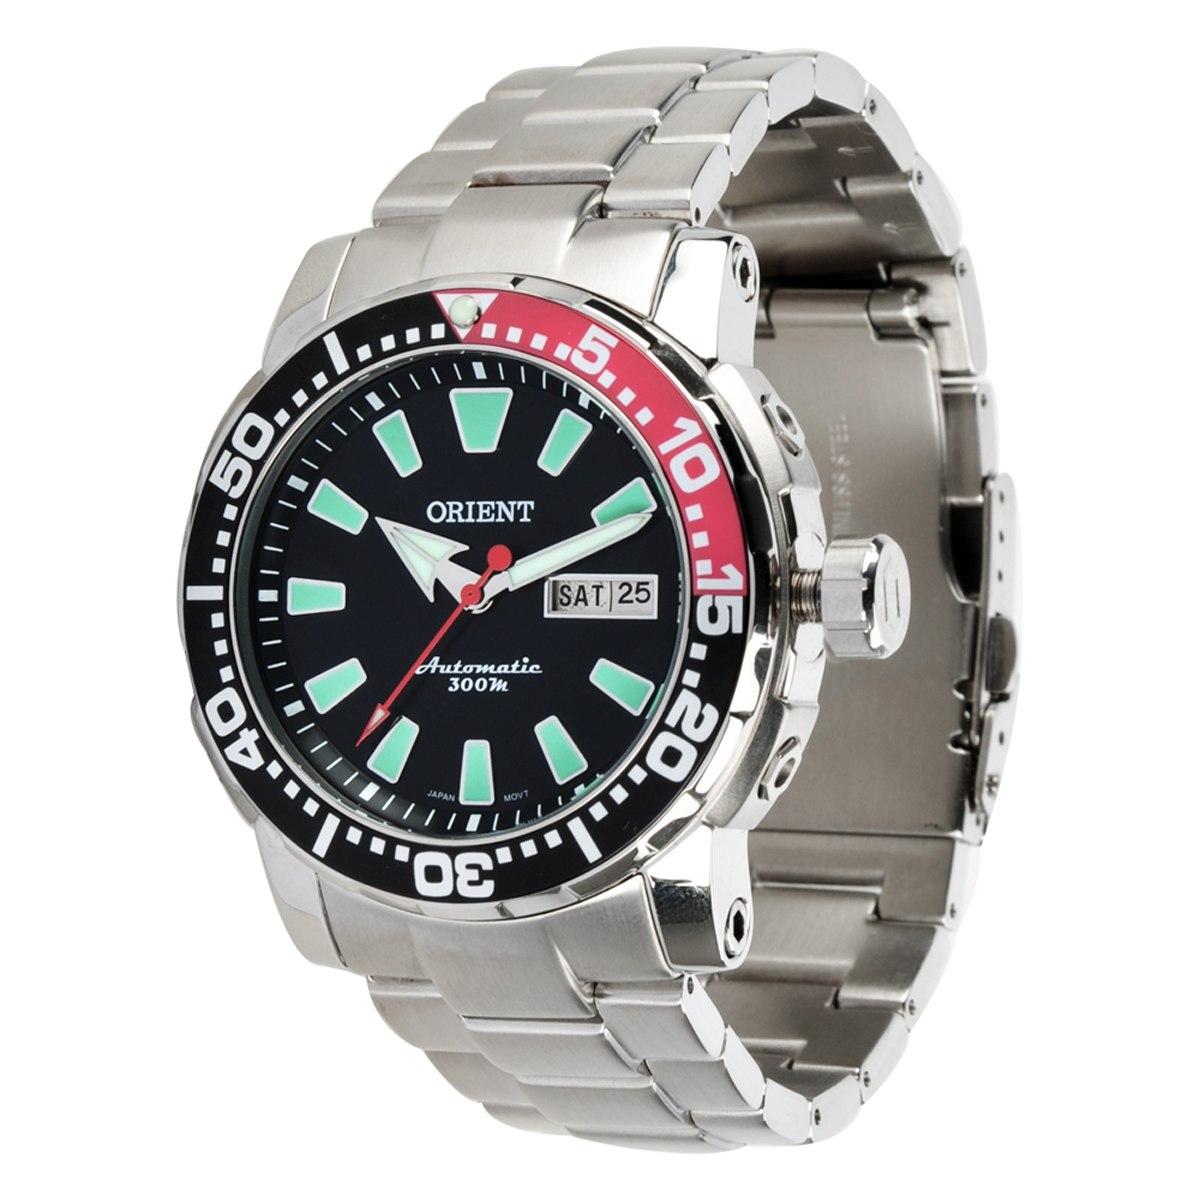 ac719240902 relógio orient automático analógico sport masculino 469ss039. Carregando  zoom.